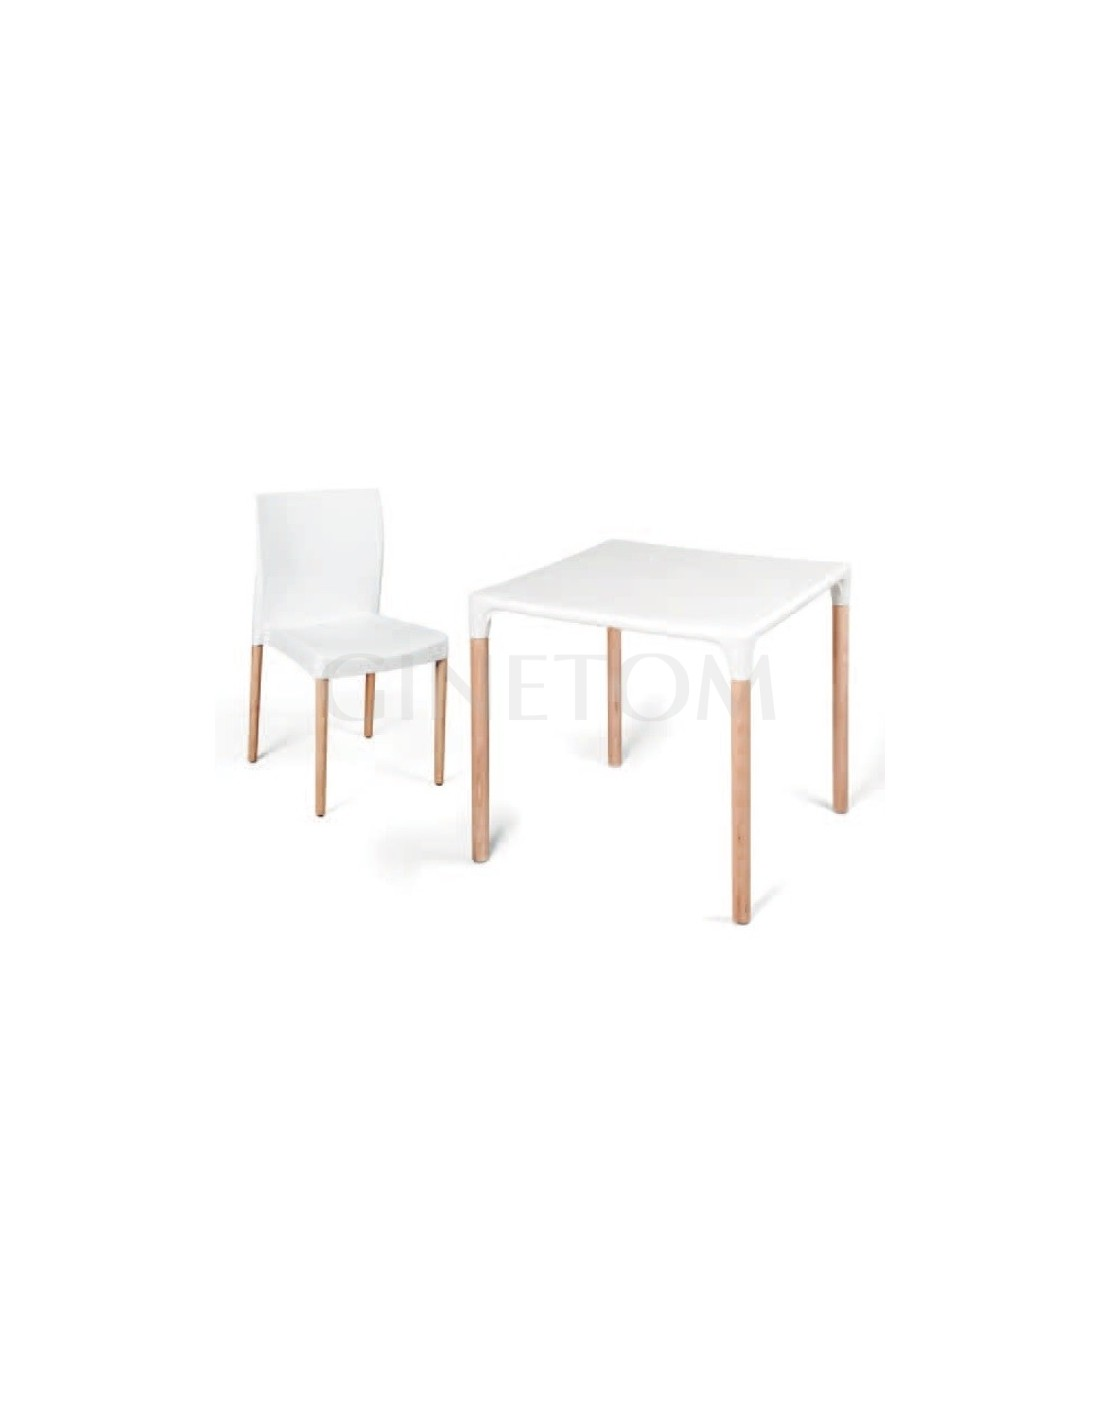 Sillas de madera monaco y mesa a juego sillas hosteler a for Mesa 70x70 madera